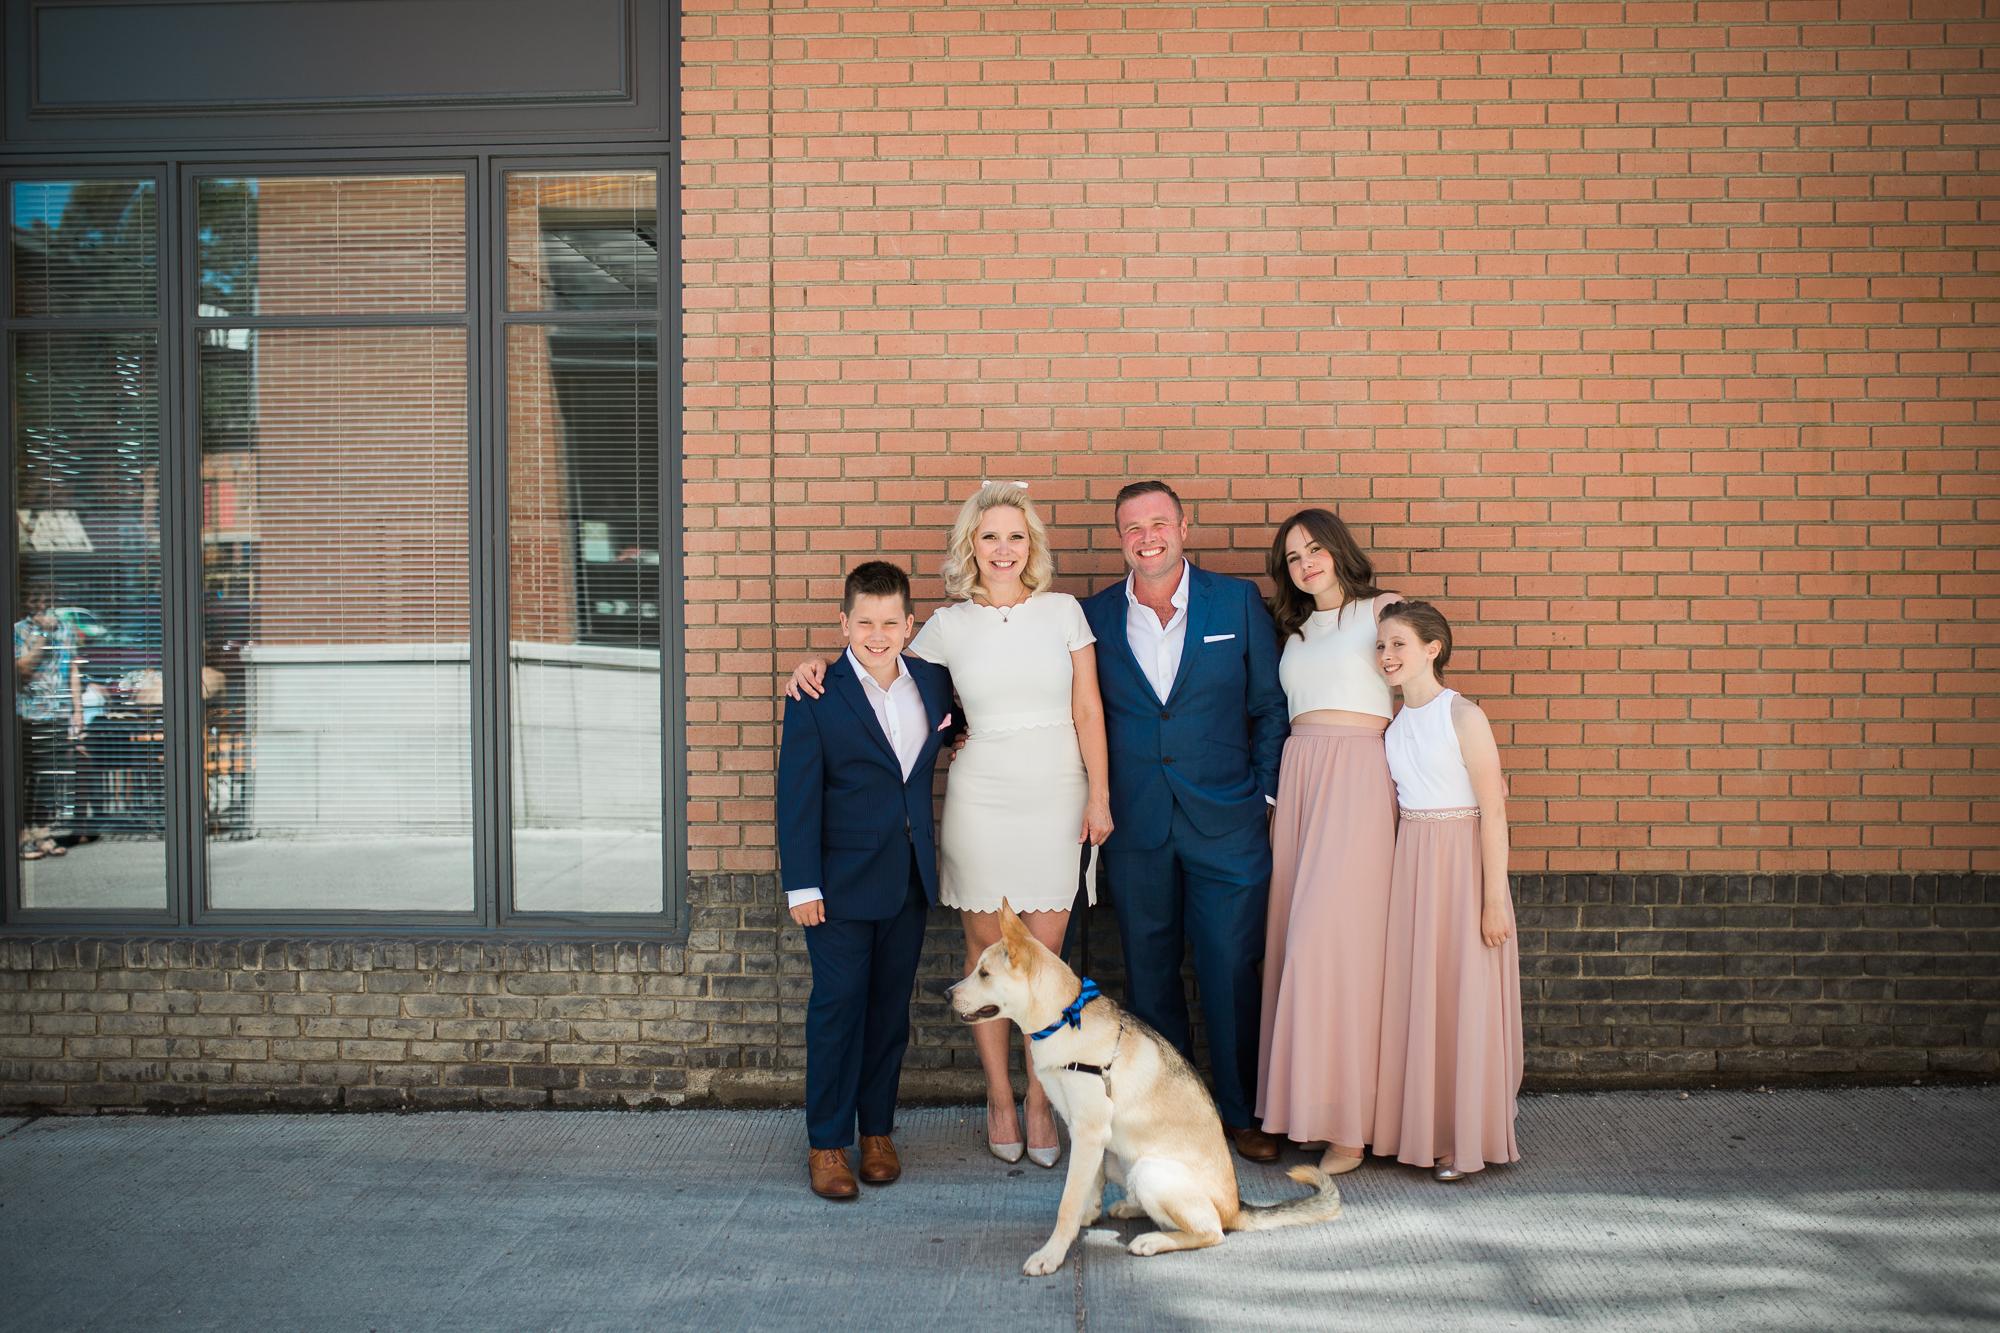 Calgary-wedding-photographer-CG-10.jpg